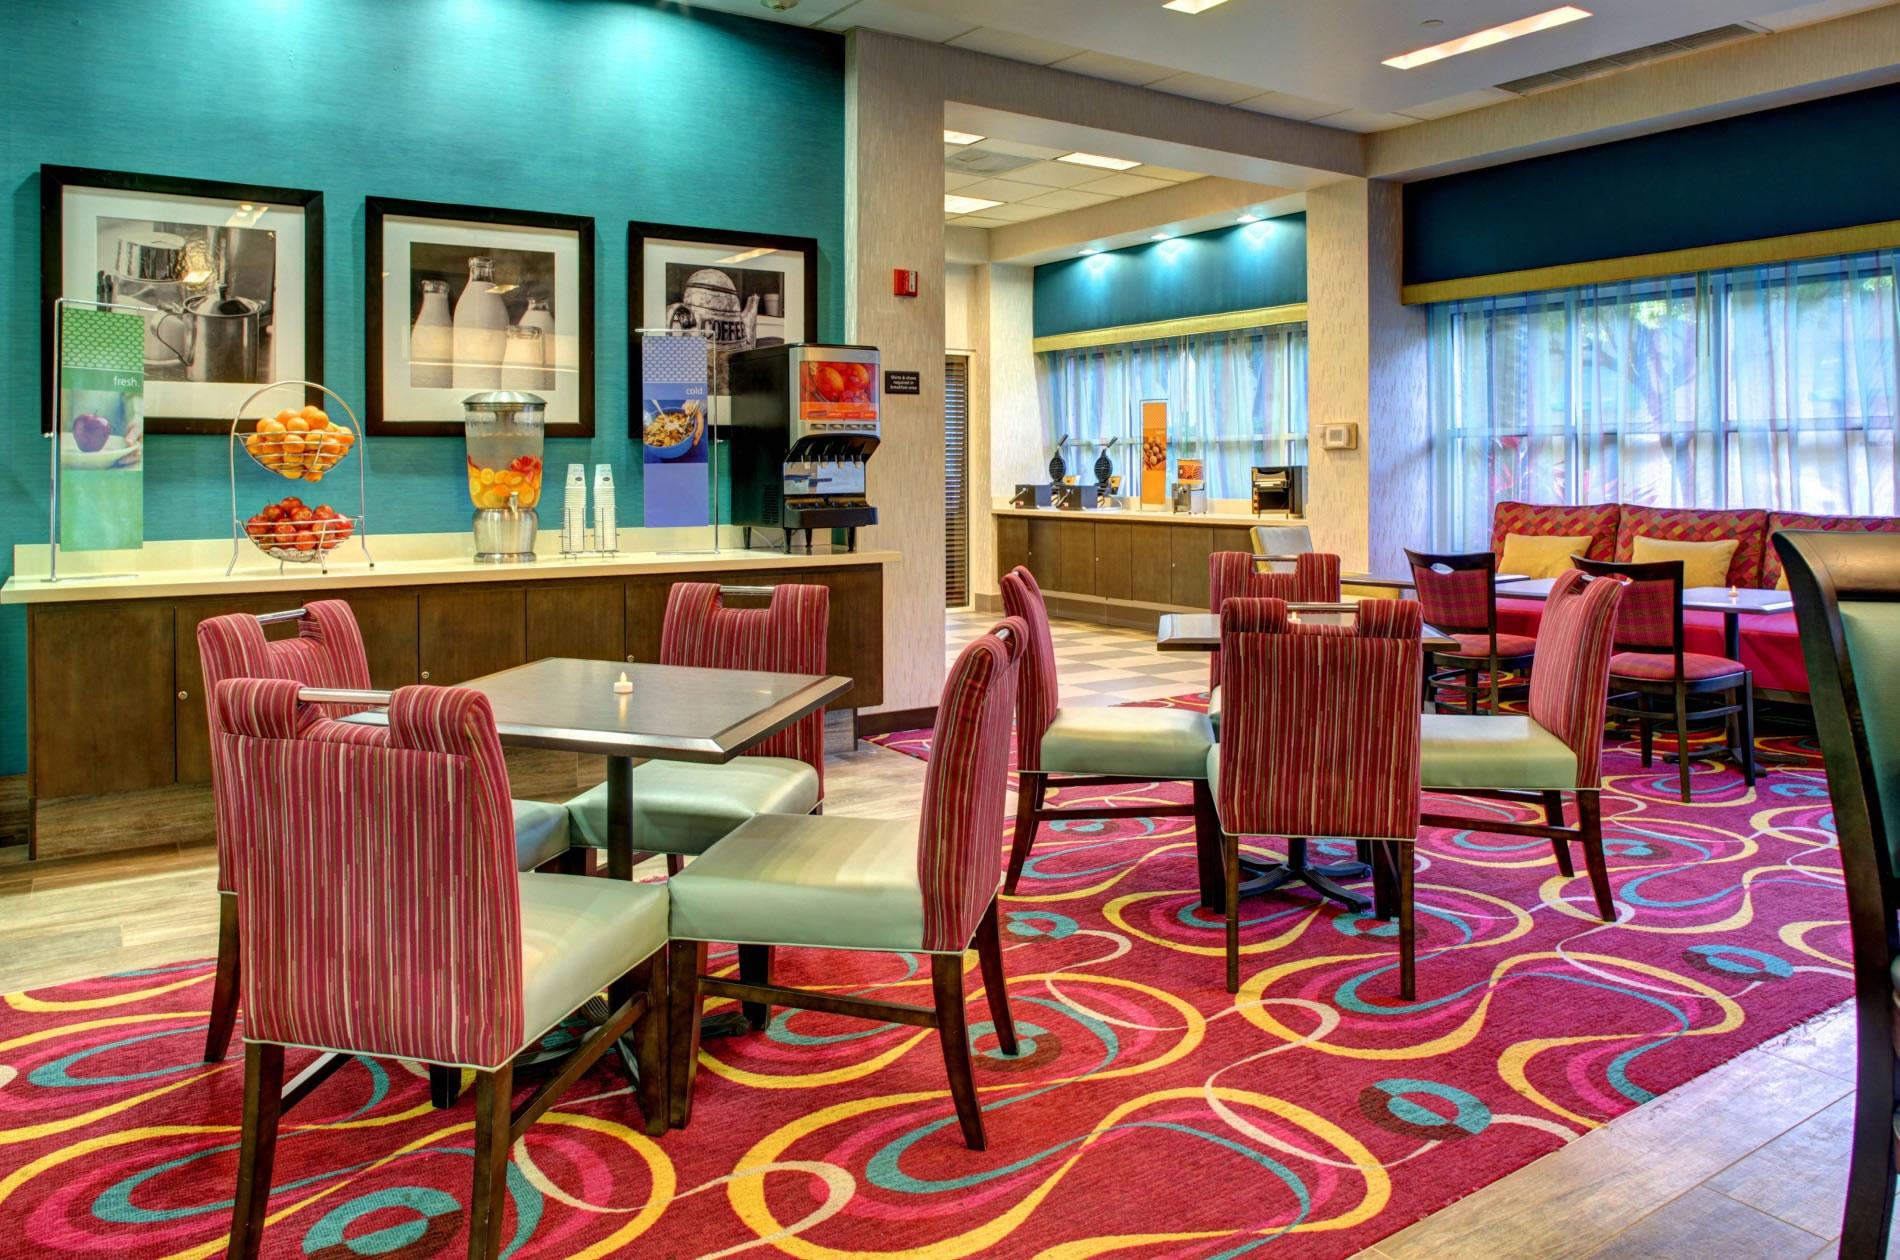 Hampton Inn by Hilton Coconut Grove Coral Gables Miami image 2